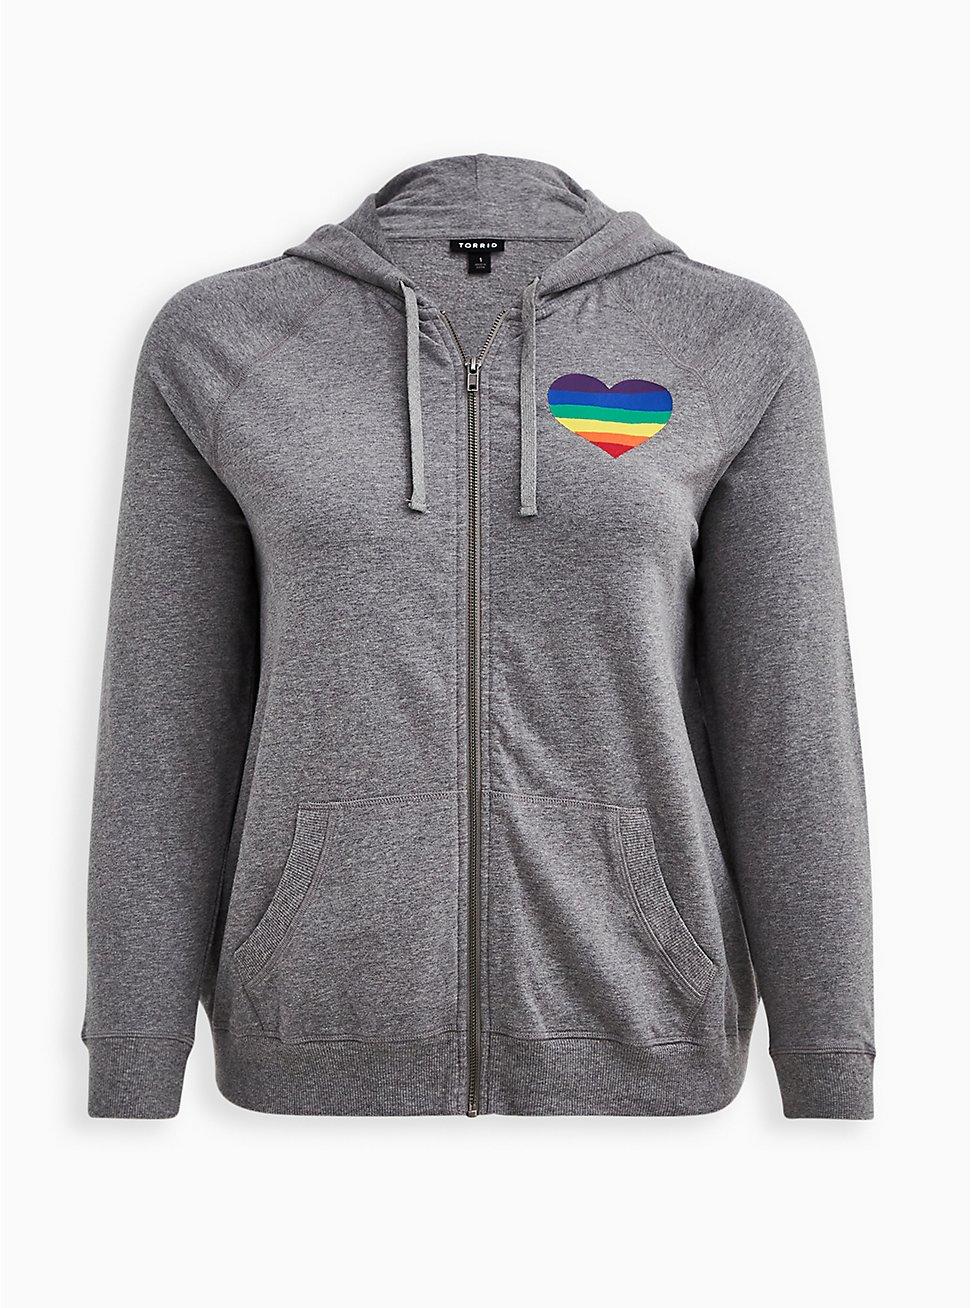 Celebrate Love Zip-Up Hoodie - Rainbow Heart Grey, MEDIUM HEATHER GREY, hi-res